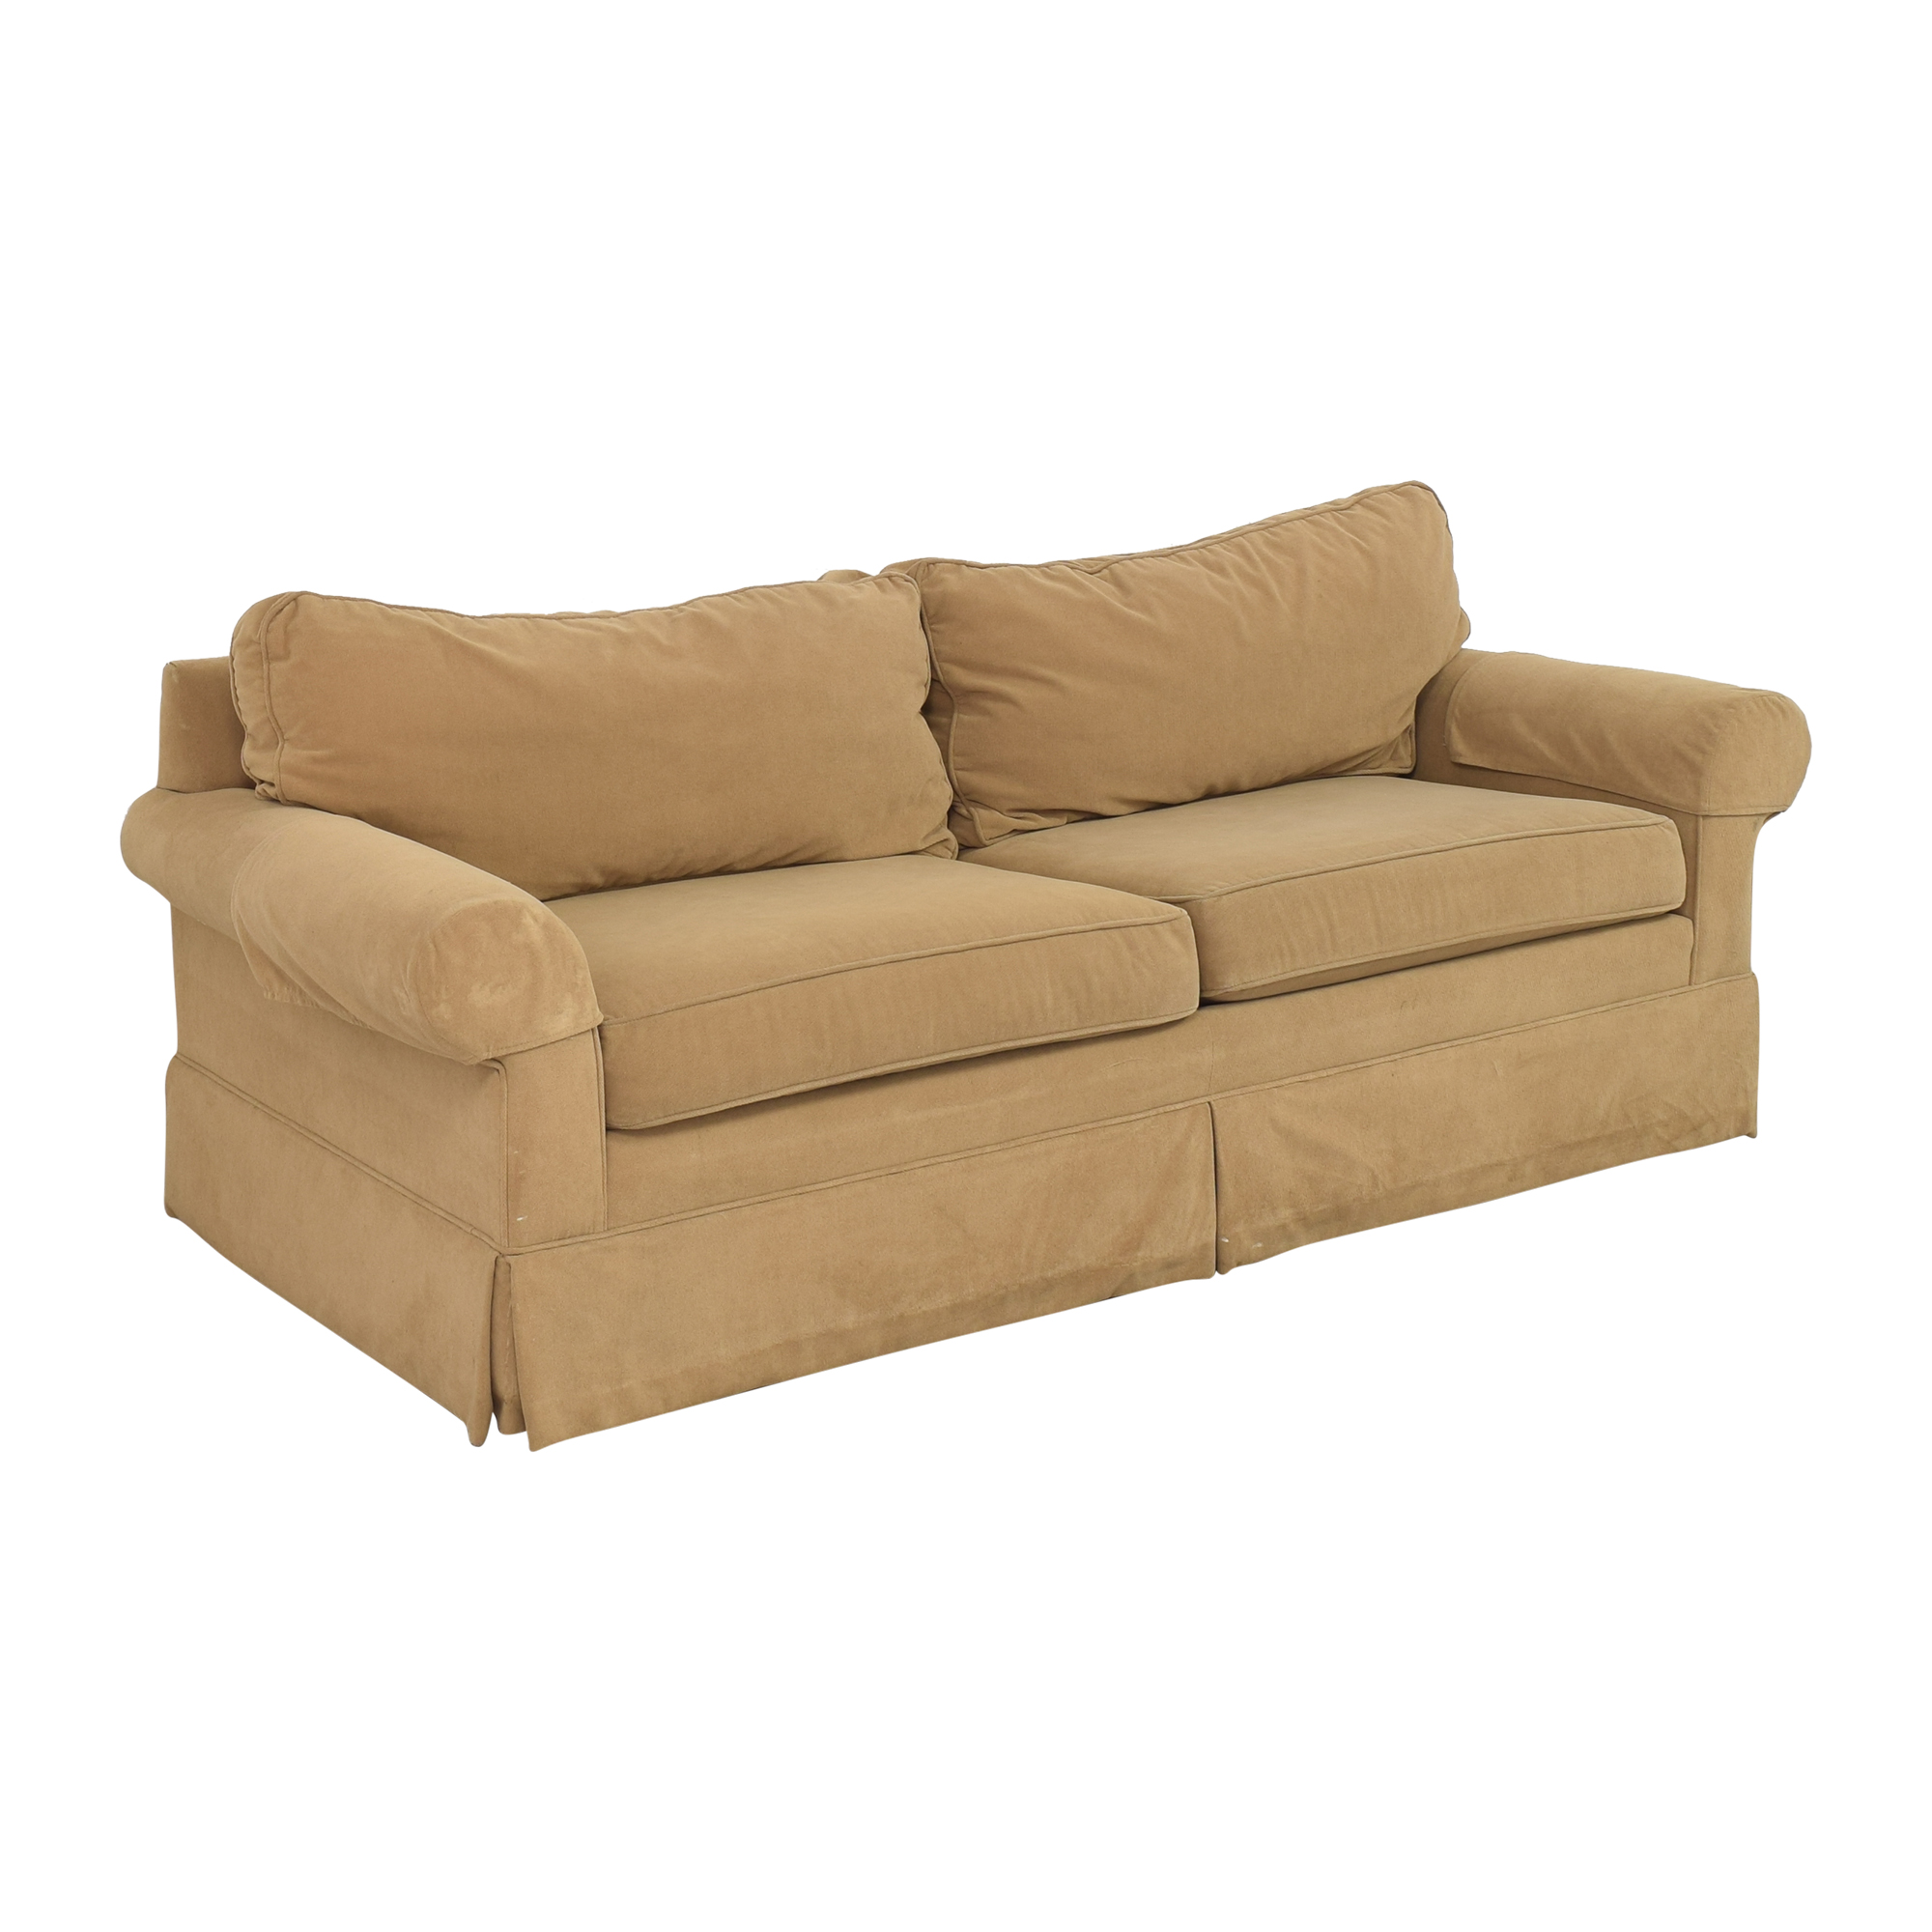 buy Ethan Allen Ethan Allen Skirted Roll Arm Sofa online